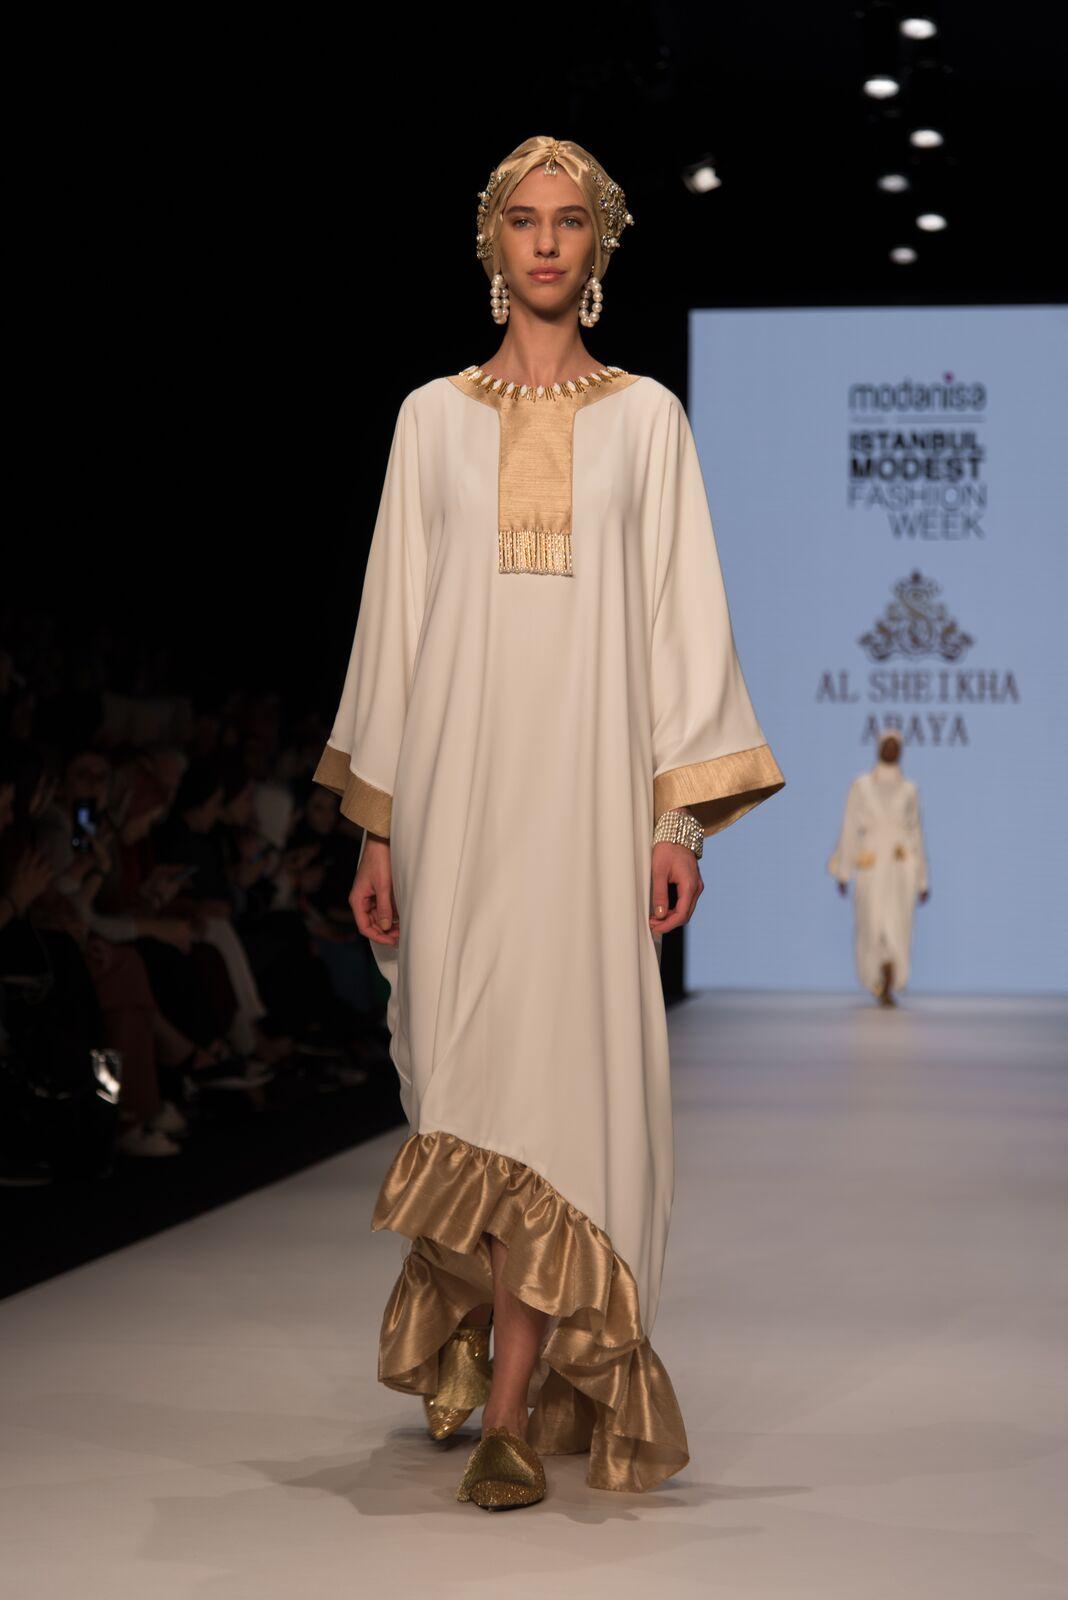 Al sheikha abaya at istanbul modest fashion week 2019 day 2